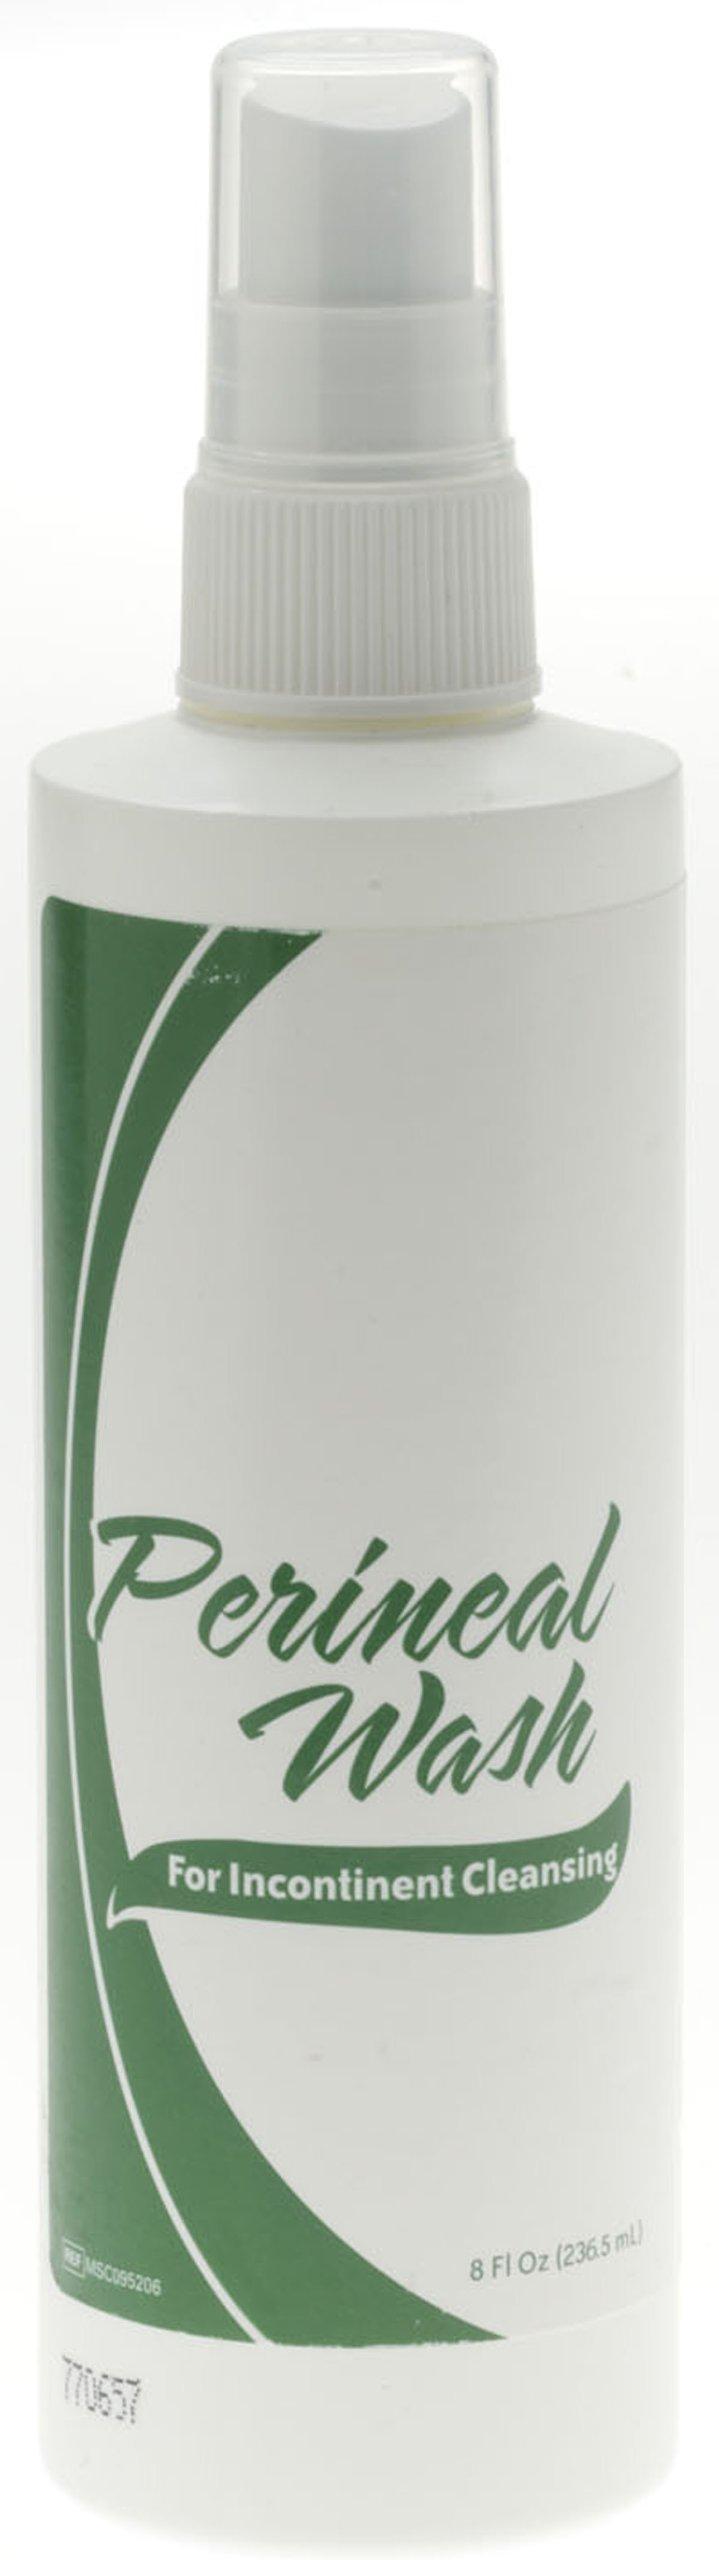 Medline MSC095206 No-Rinse Perineal Wash, 8 oz (Pack of 36)